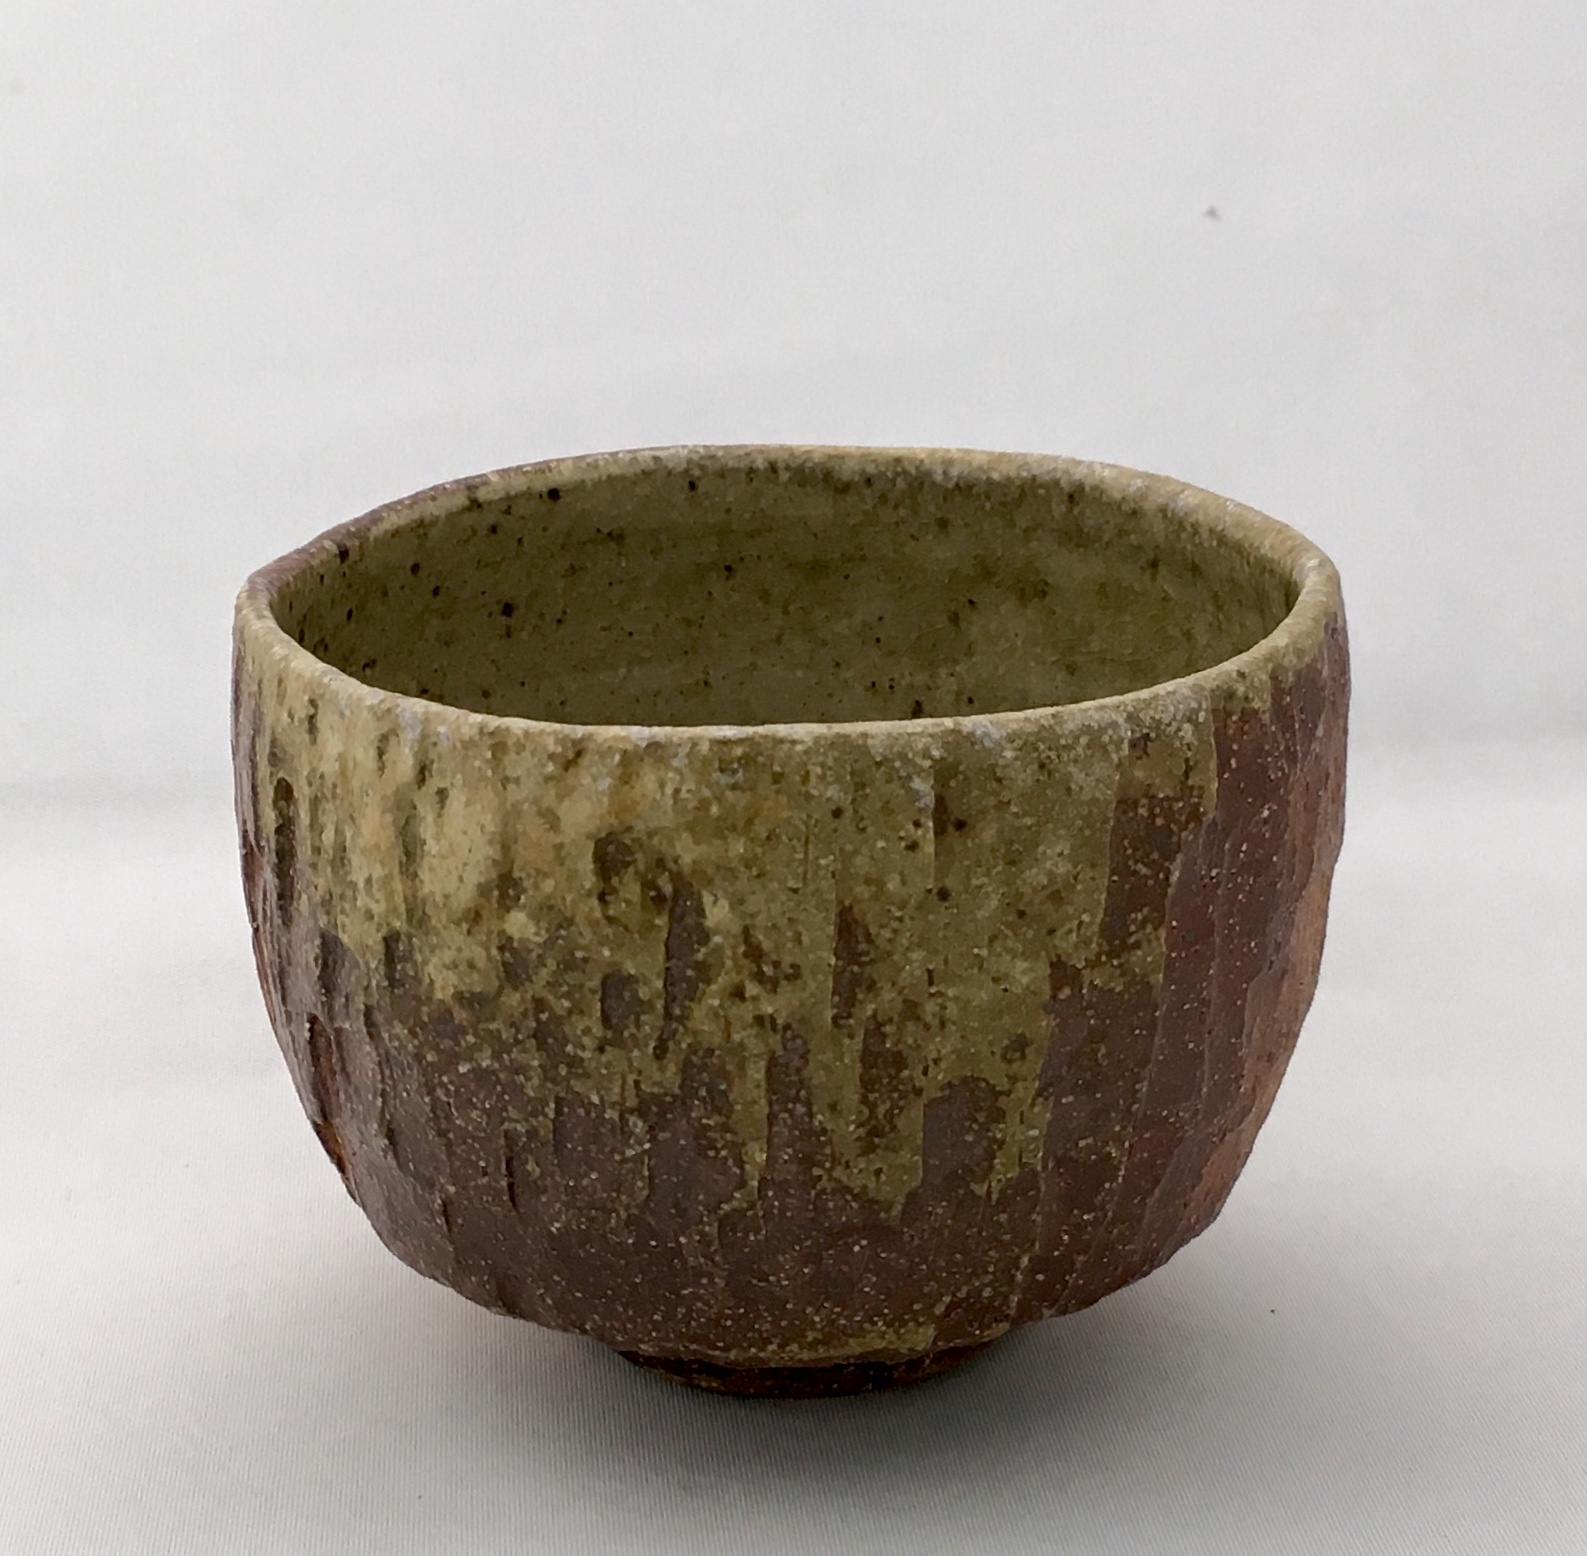 Tea bowl IMG_5141.jpg